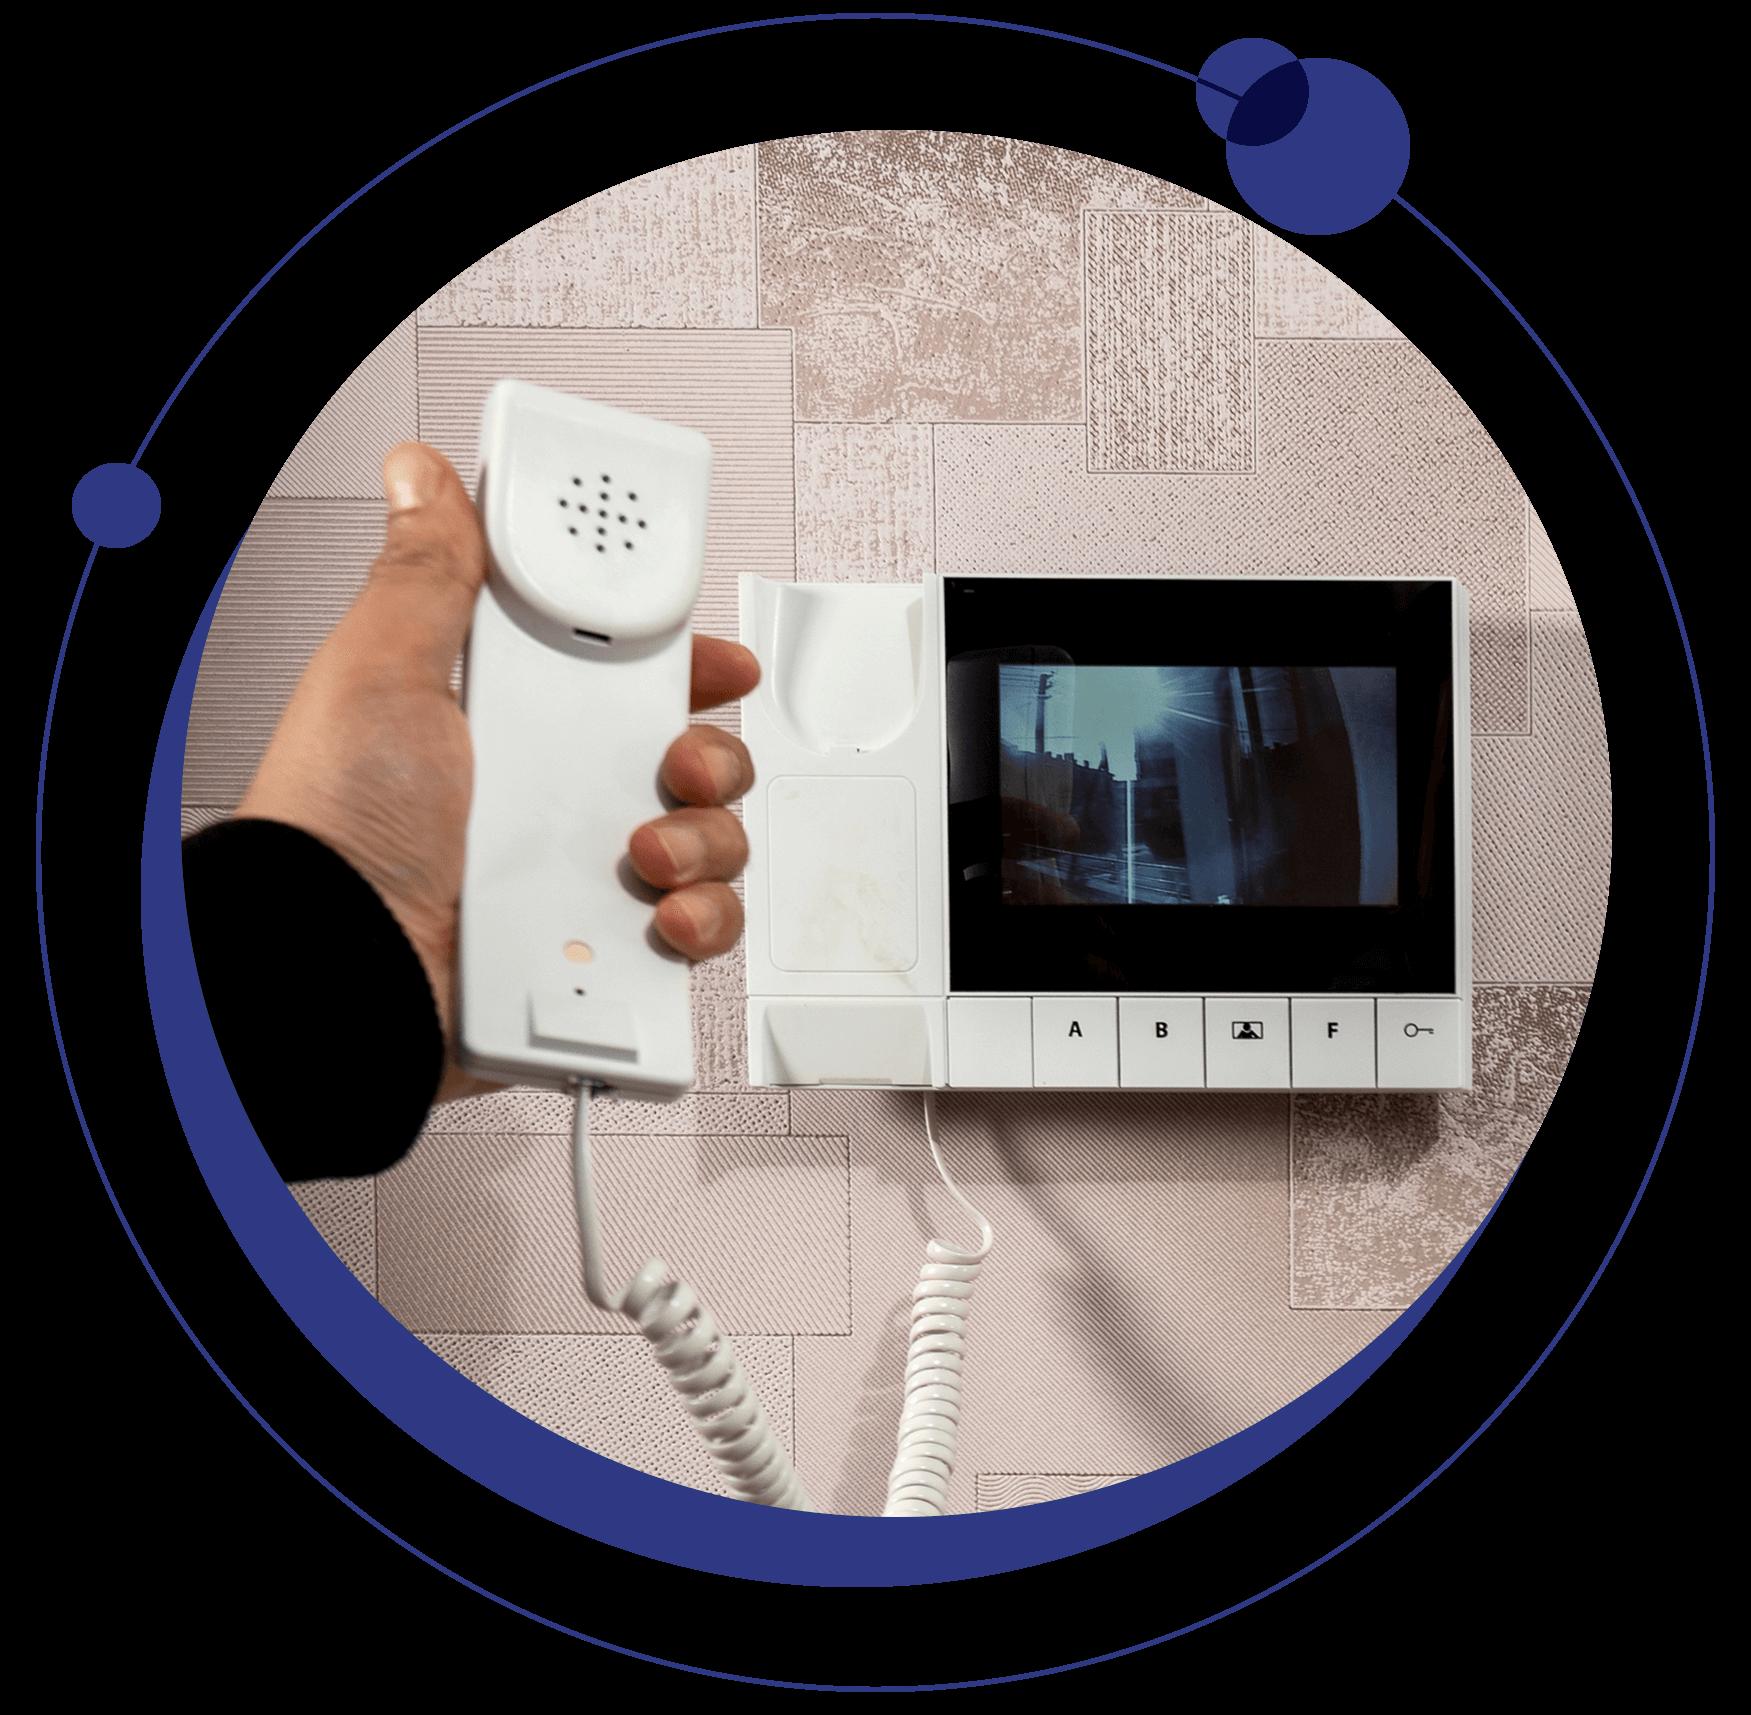 videophone02-parlophone-schaerbeek